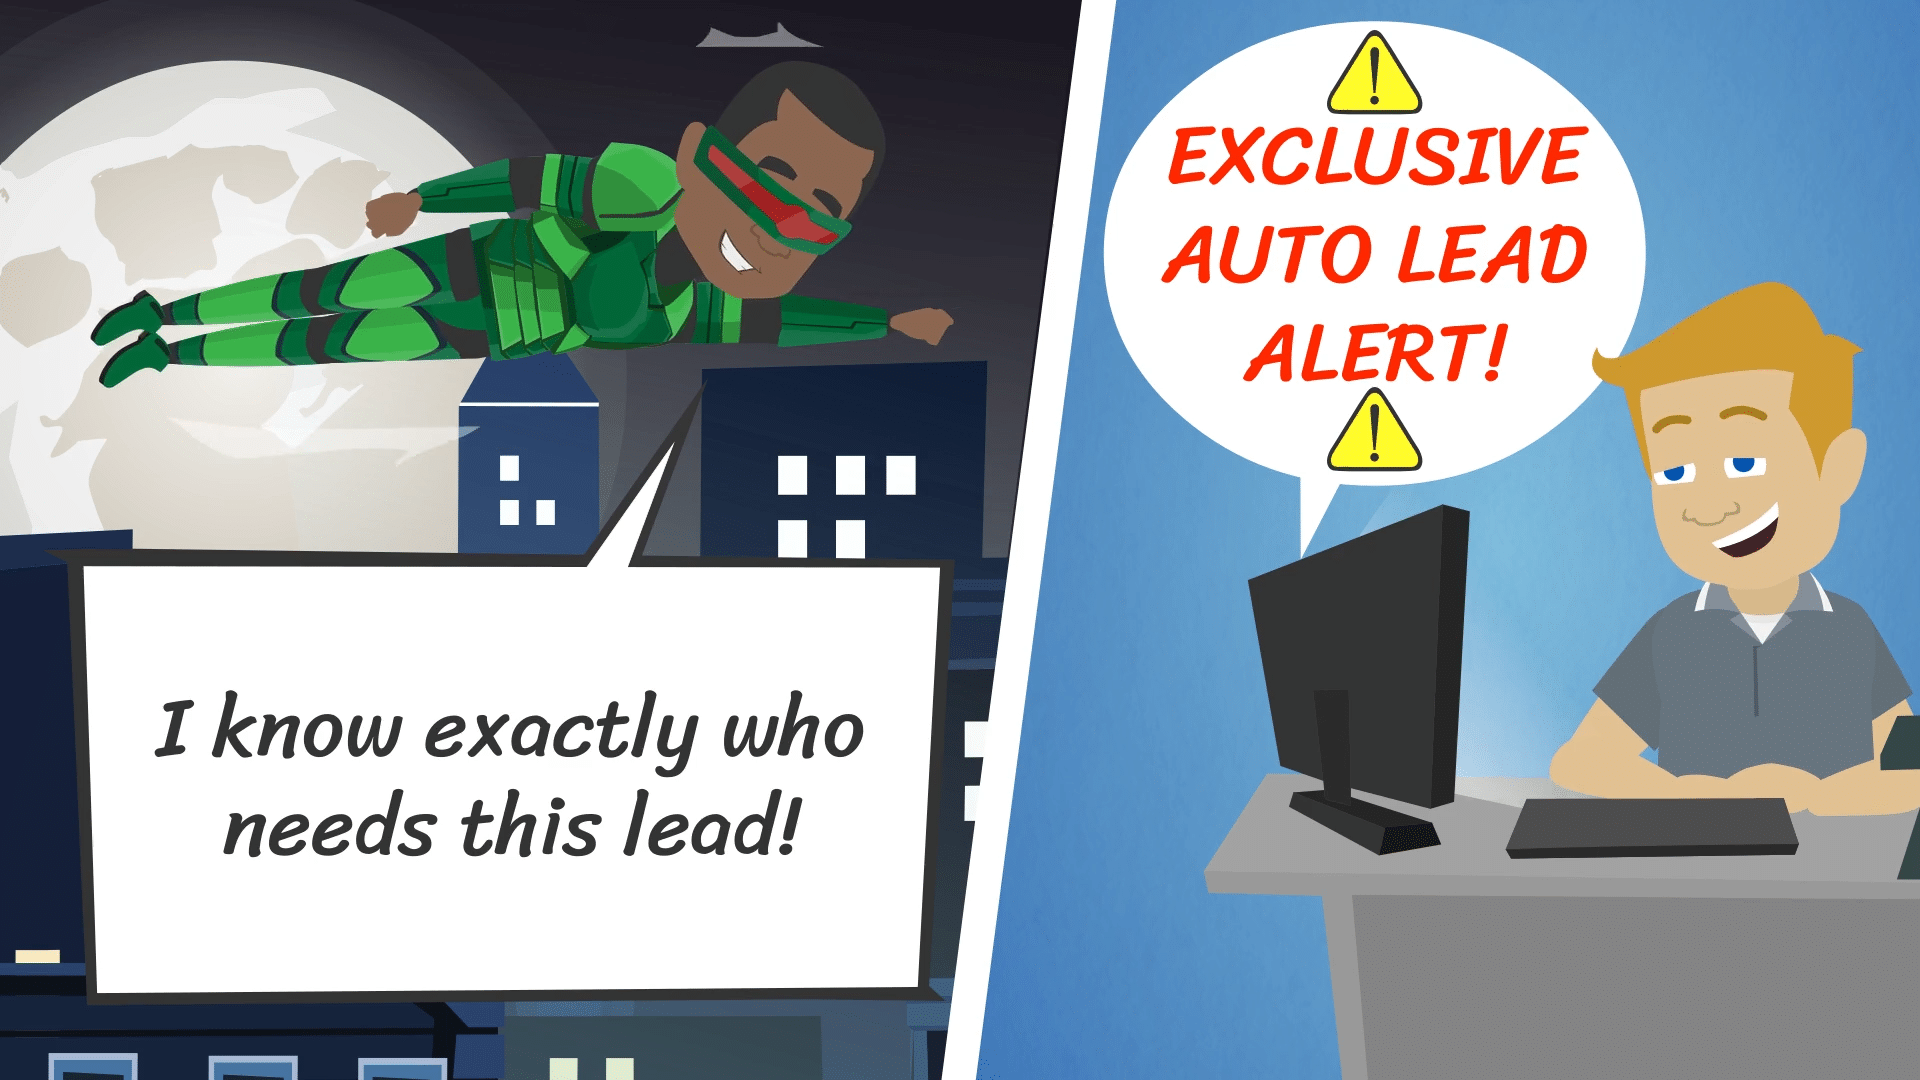 Exclusive Auto Lead Alert